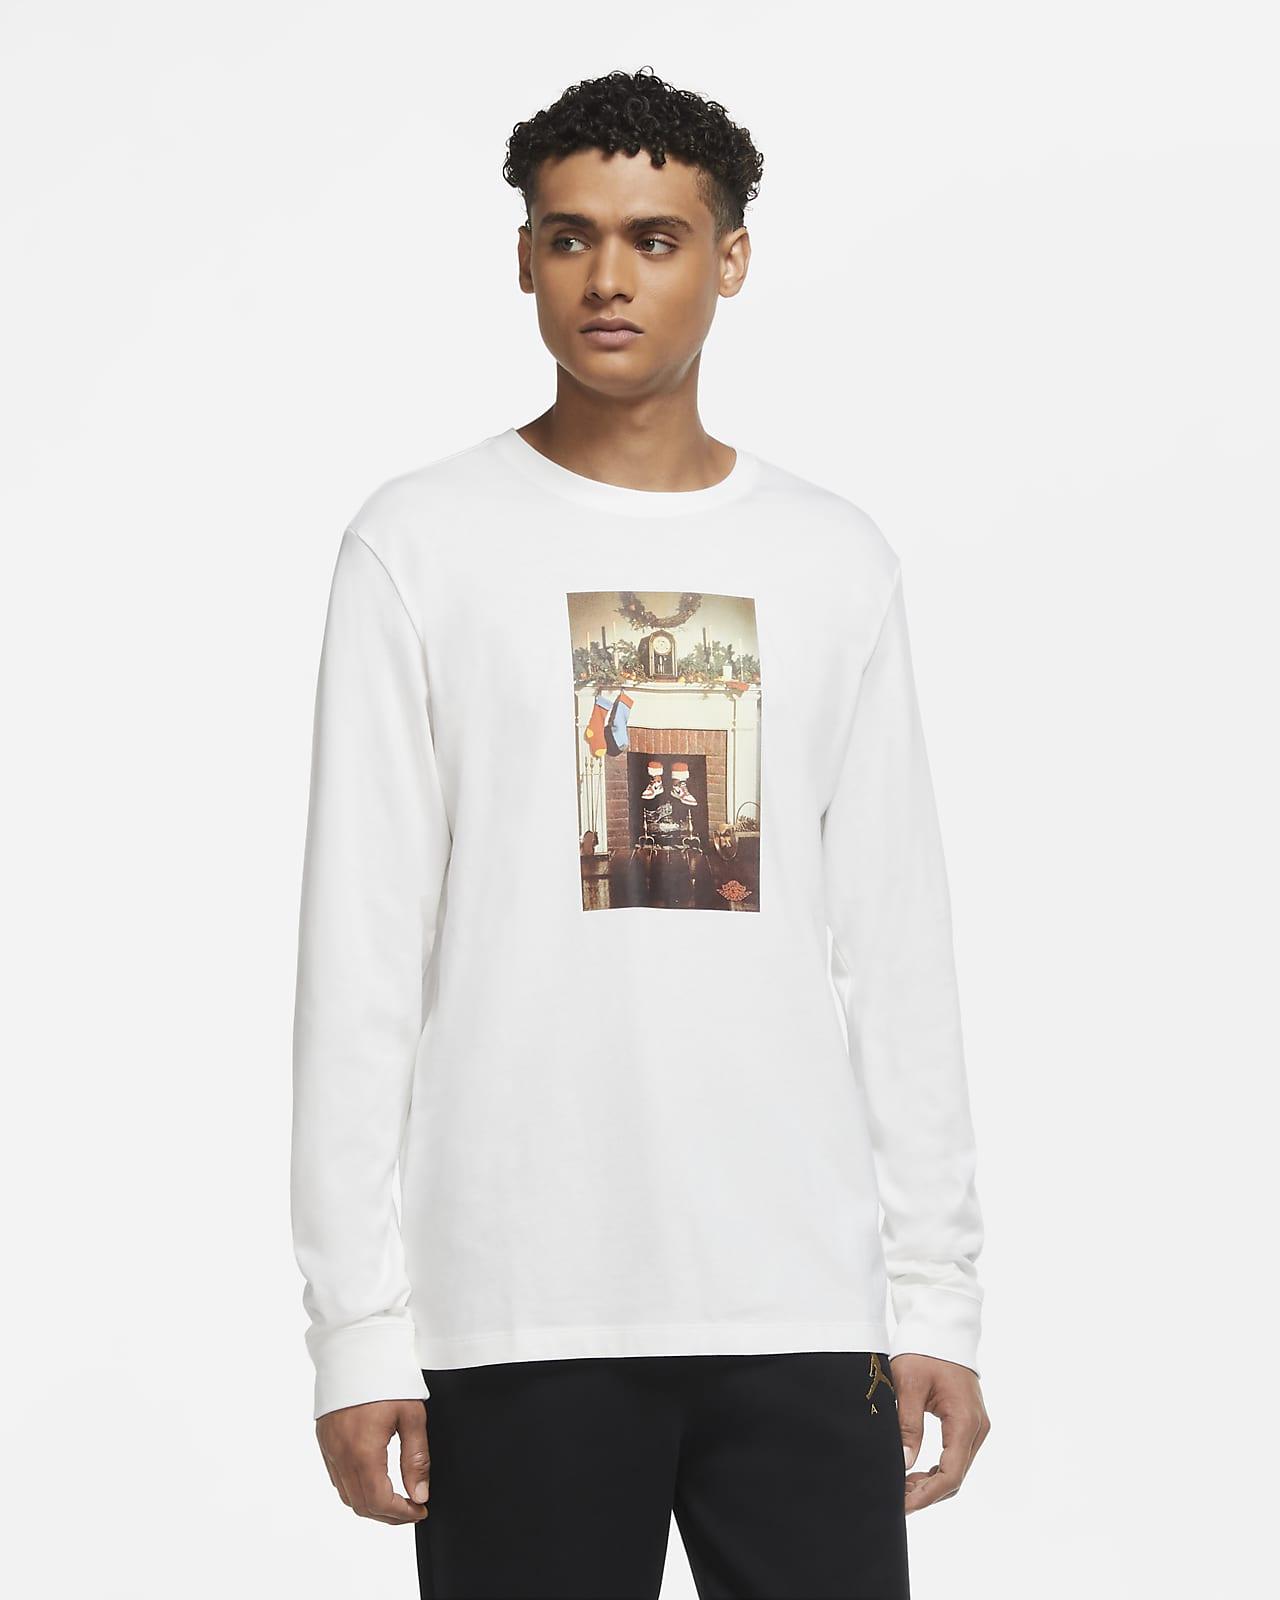 Jordan Jumpman Chimney Langarm-T-Shirt für Herren